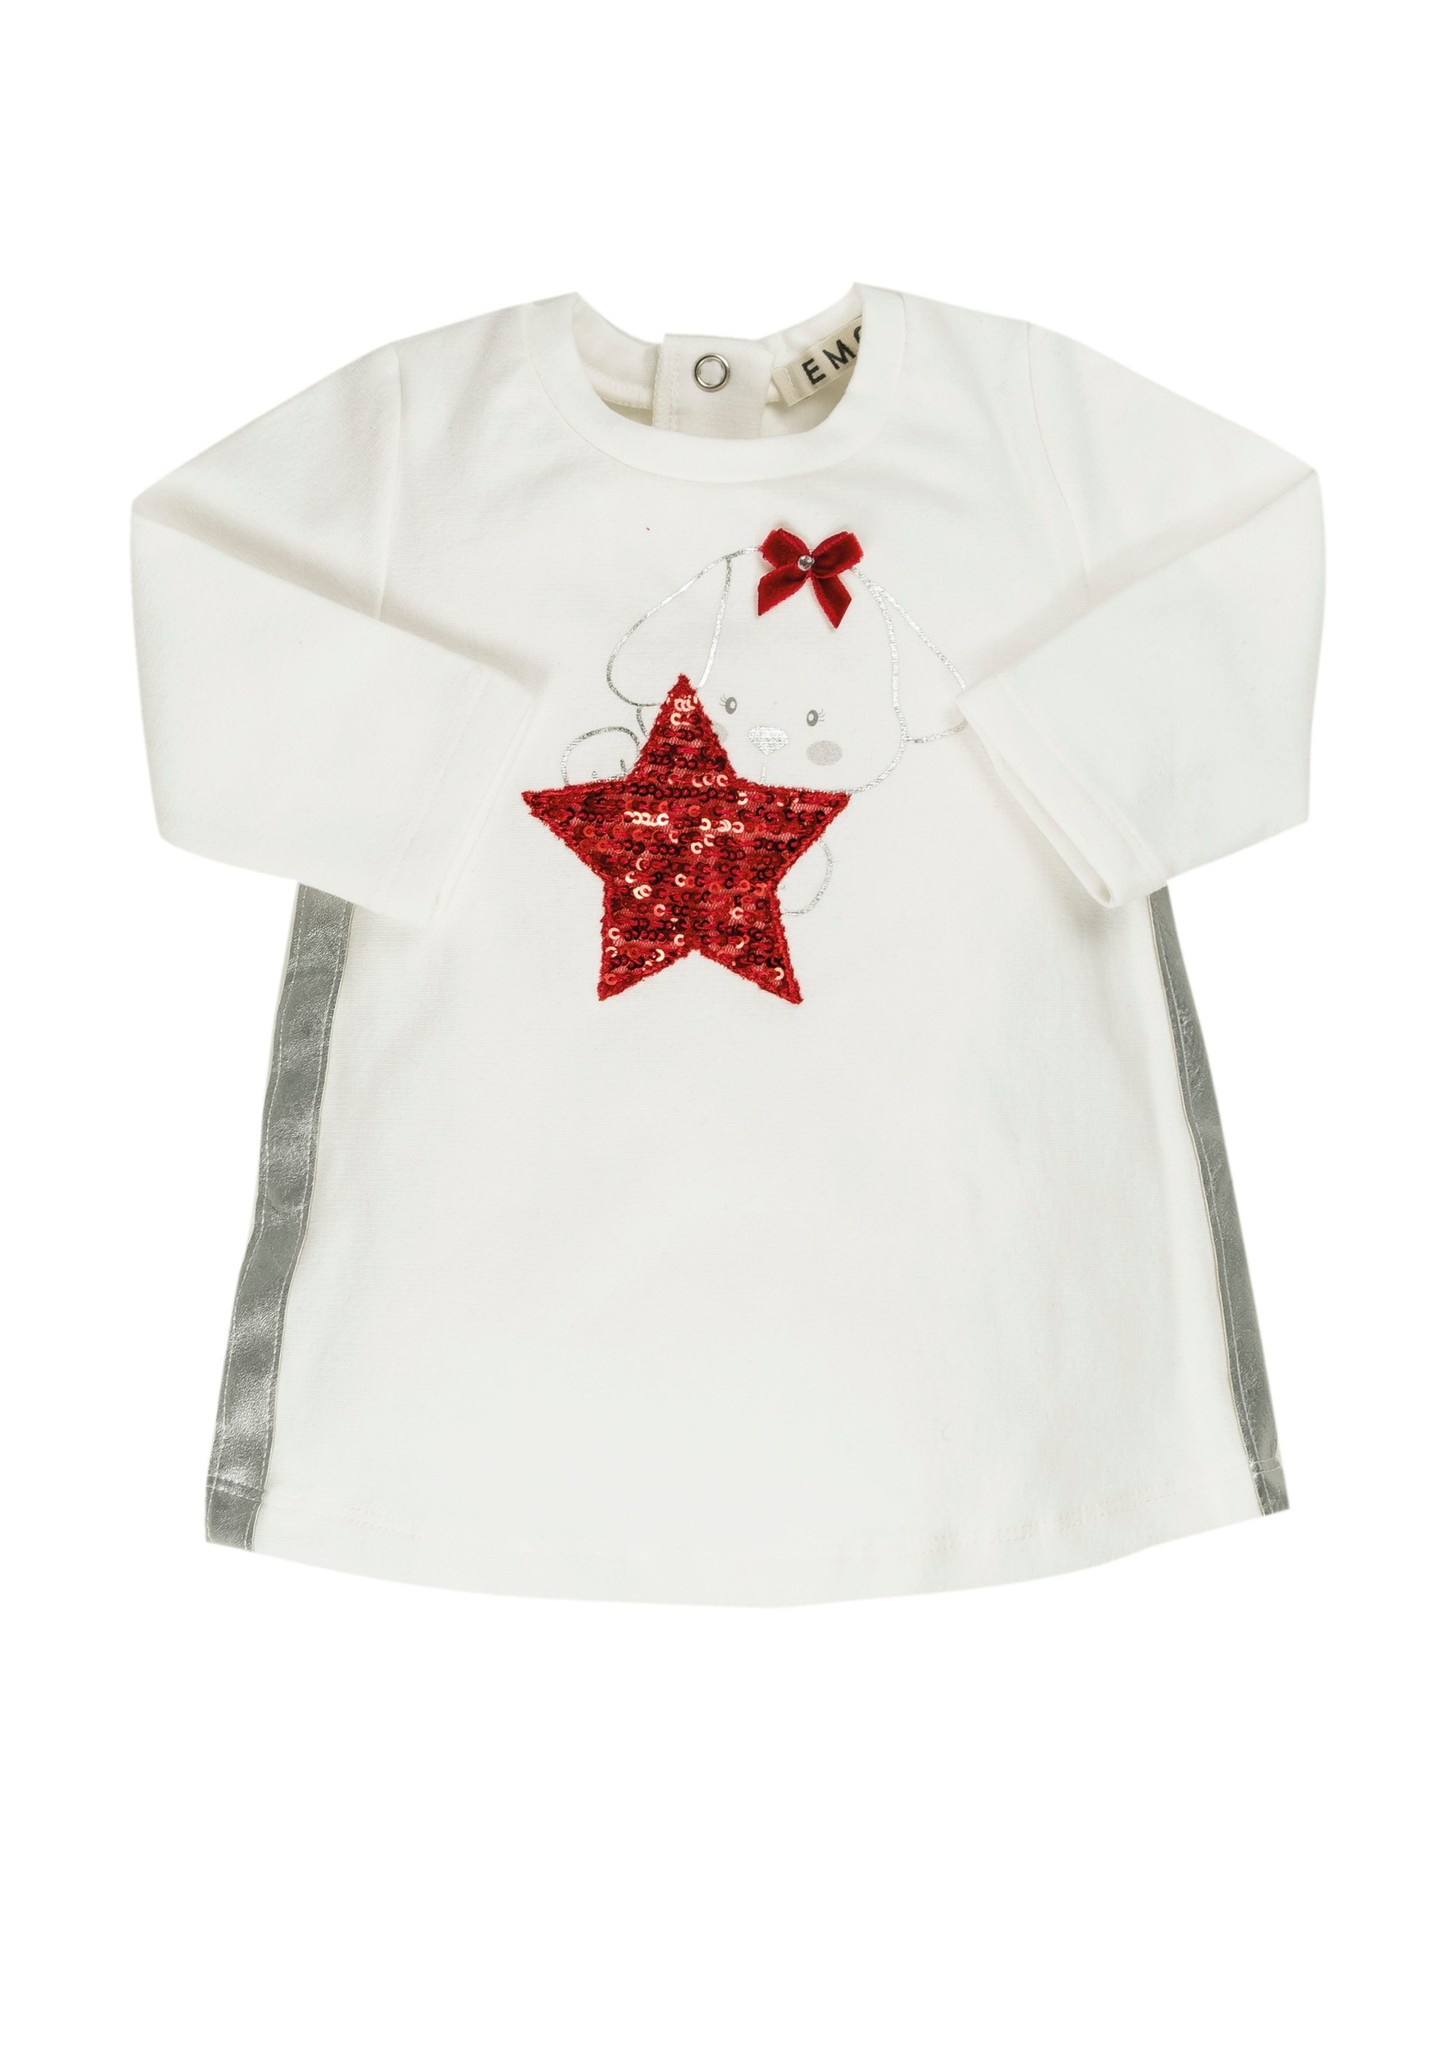 EMC EMC Girls Star Dress - 4608 AW21